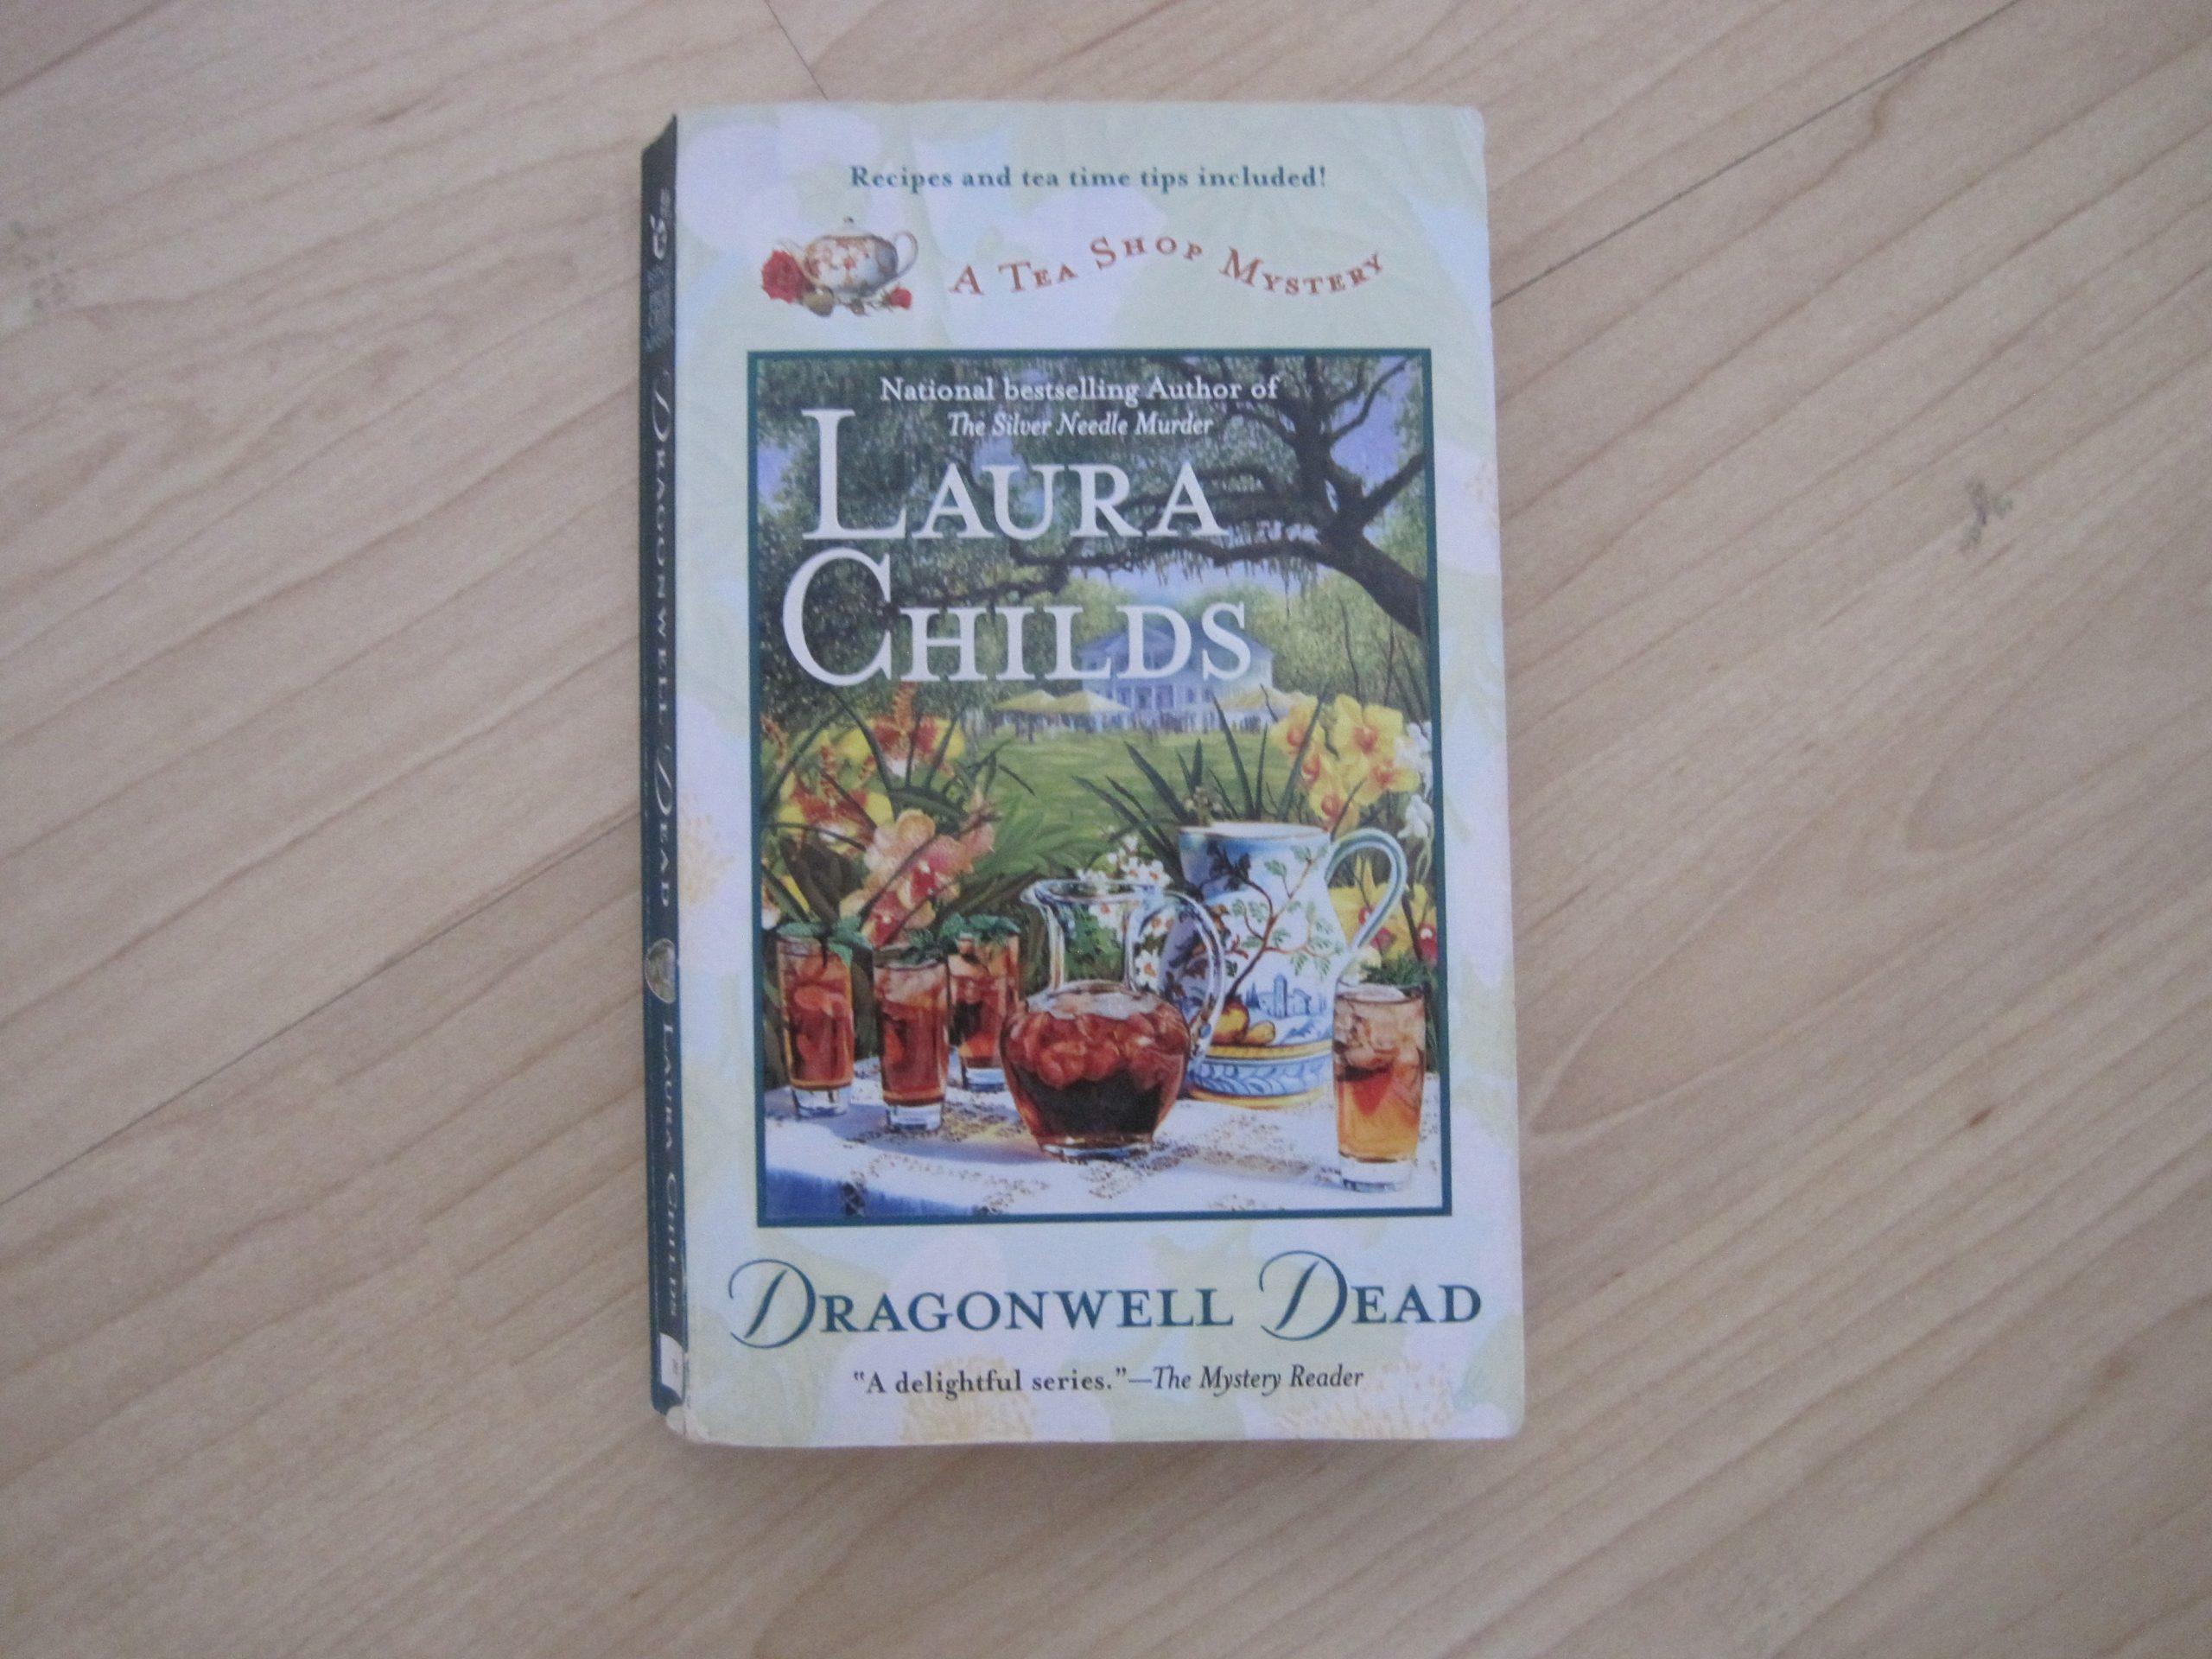 Dragonwell Dead - photo by Juliamaud